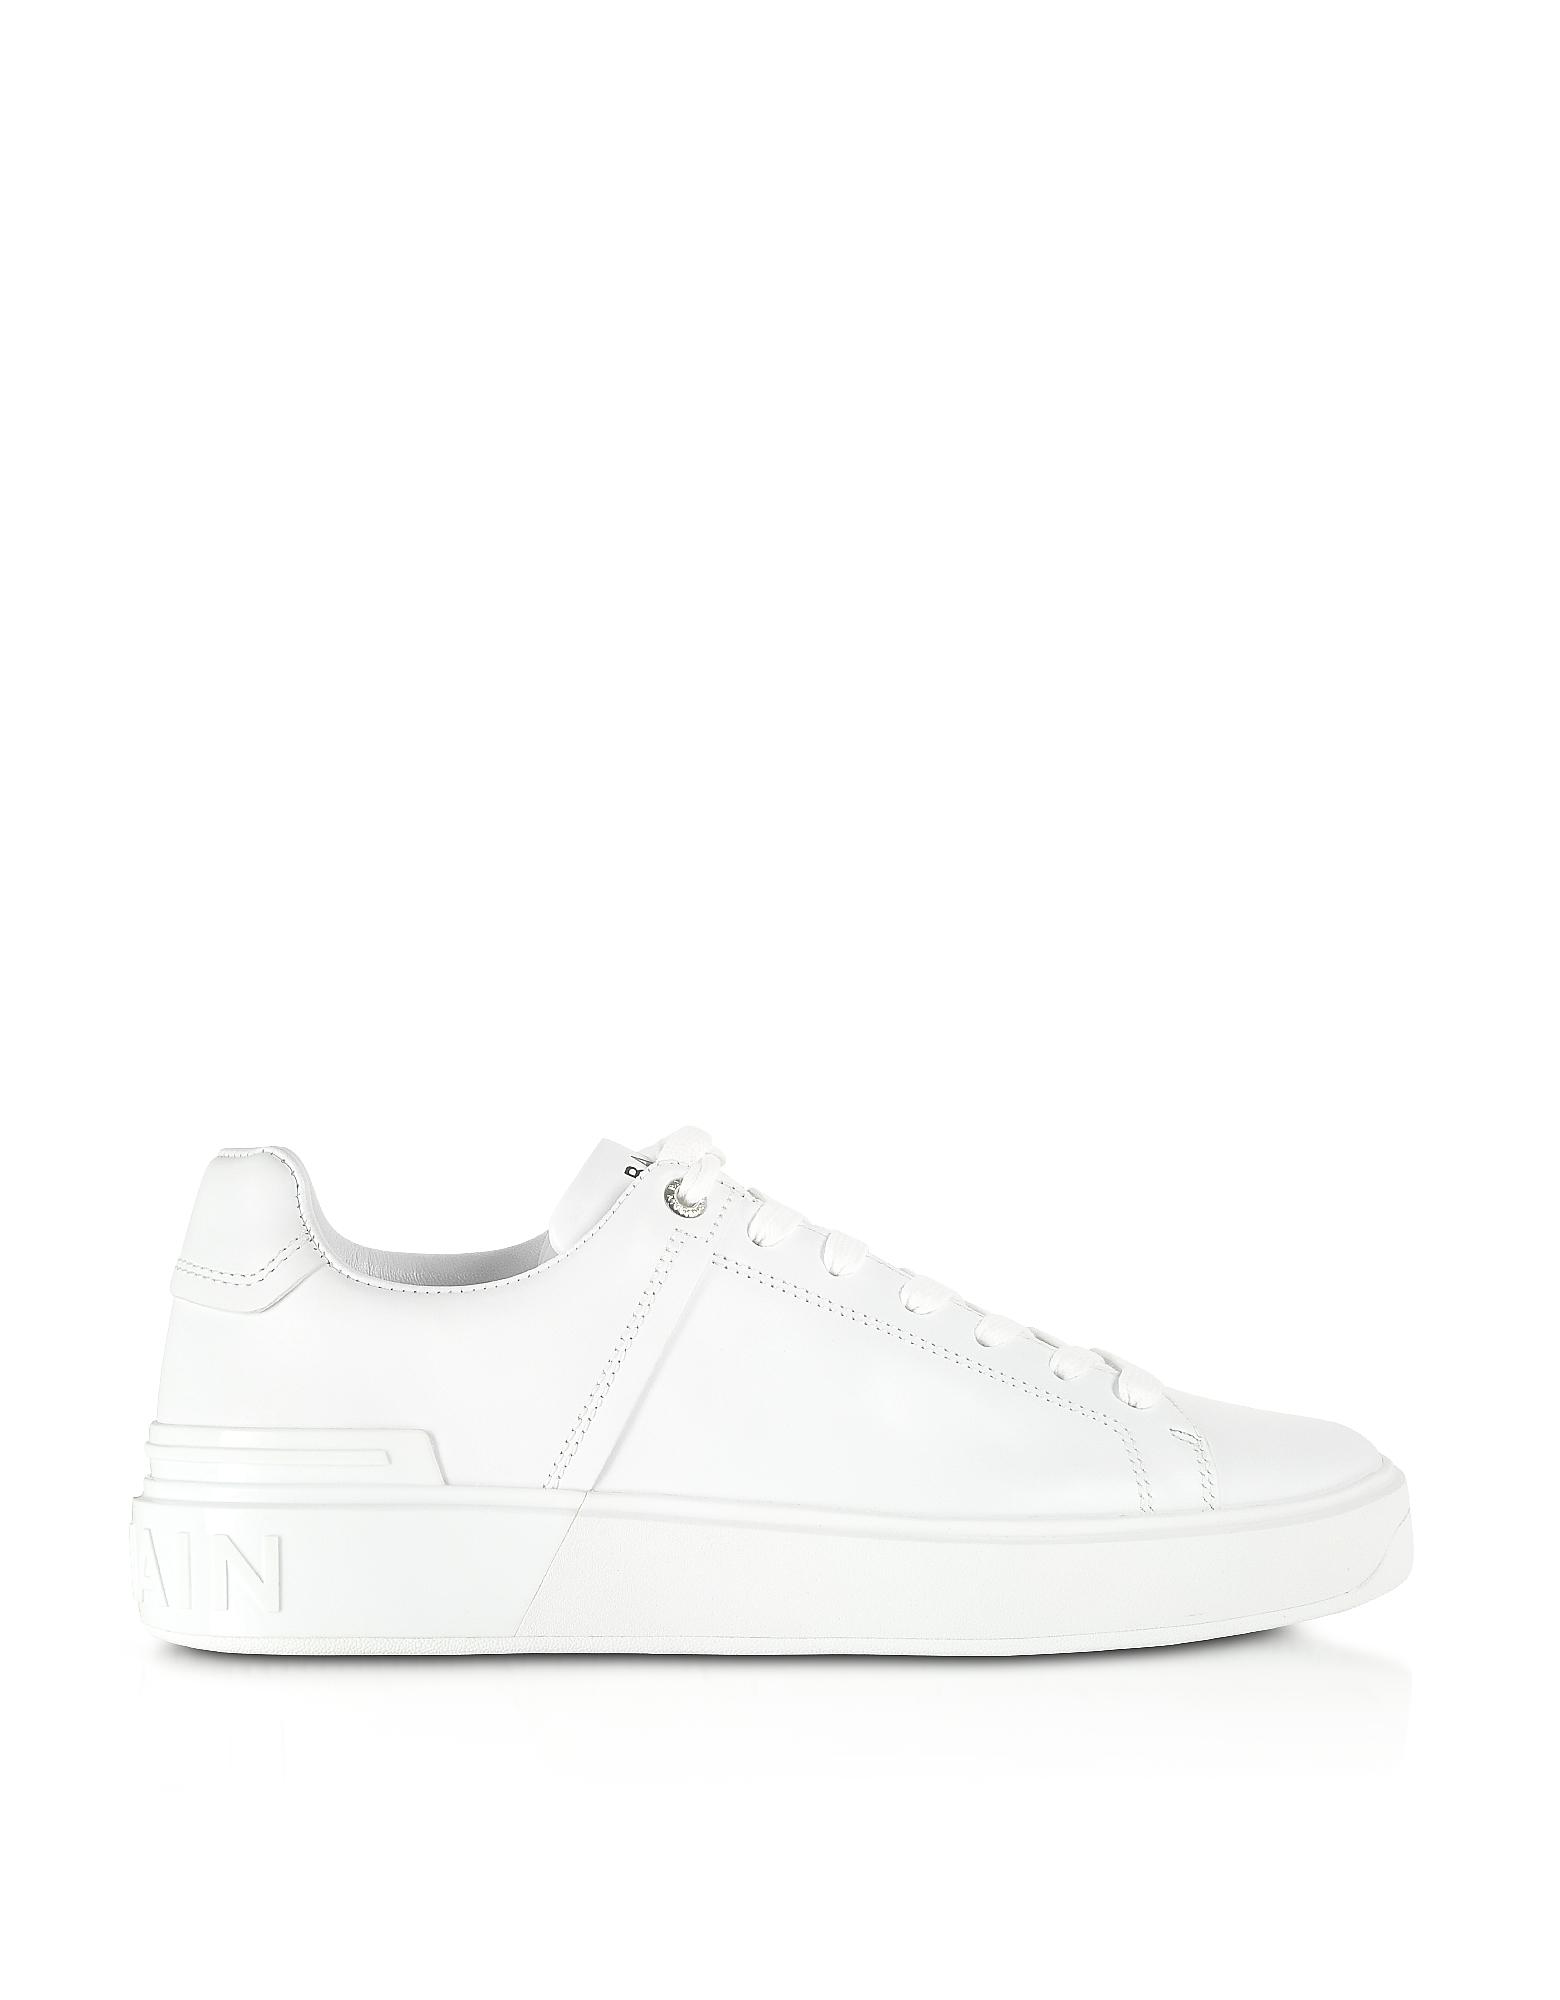 White Low Top Men's B-Court Sneakers